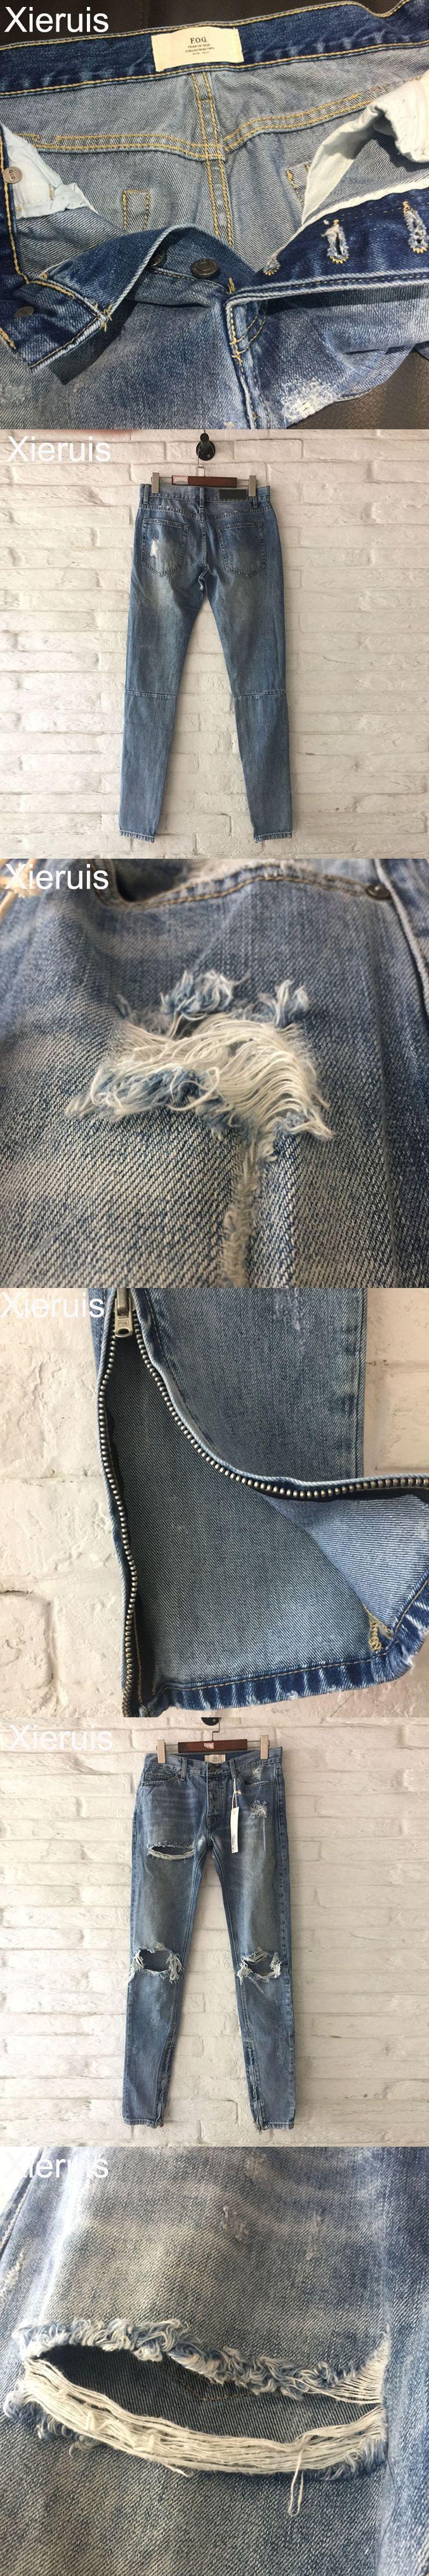 XIERUIS 2017 Autumn New Collection Two Ripped Jeans Men Ankle Zipper Destroyed Denim Pants Fog Fear Of God Hip-Hop Jeans Men